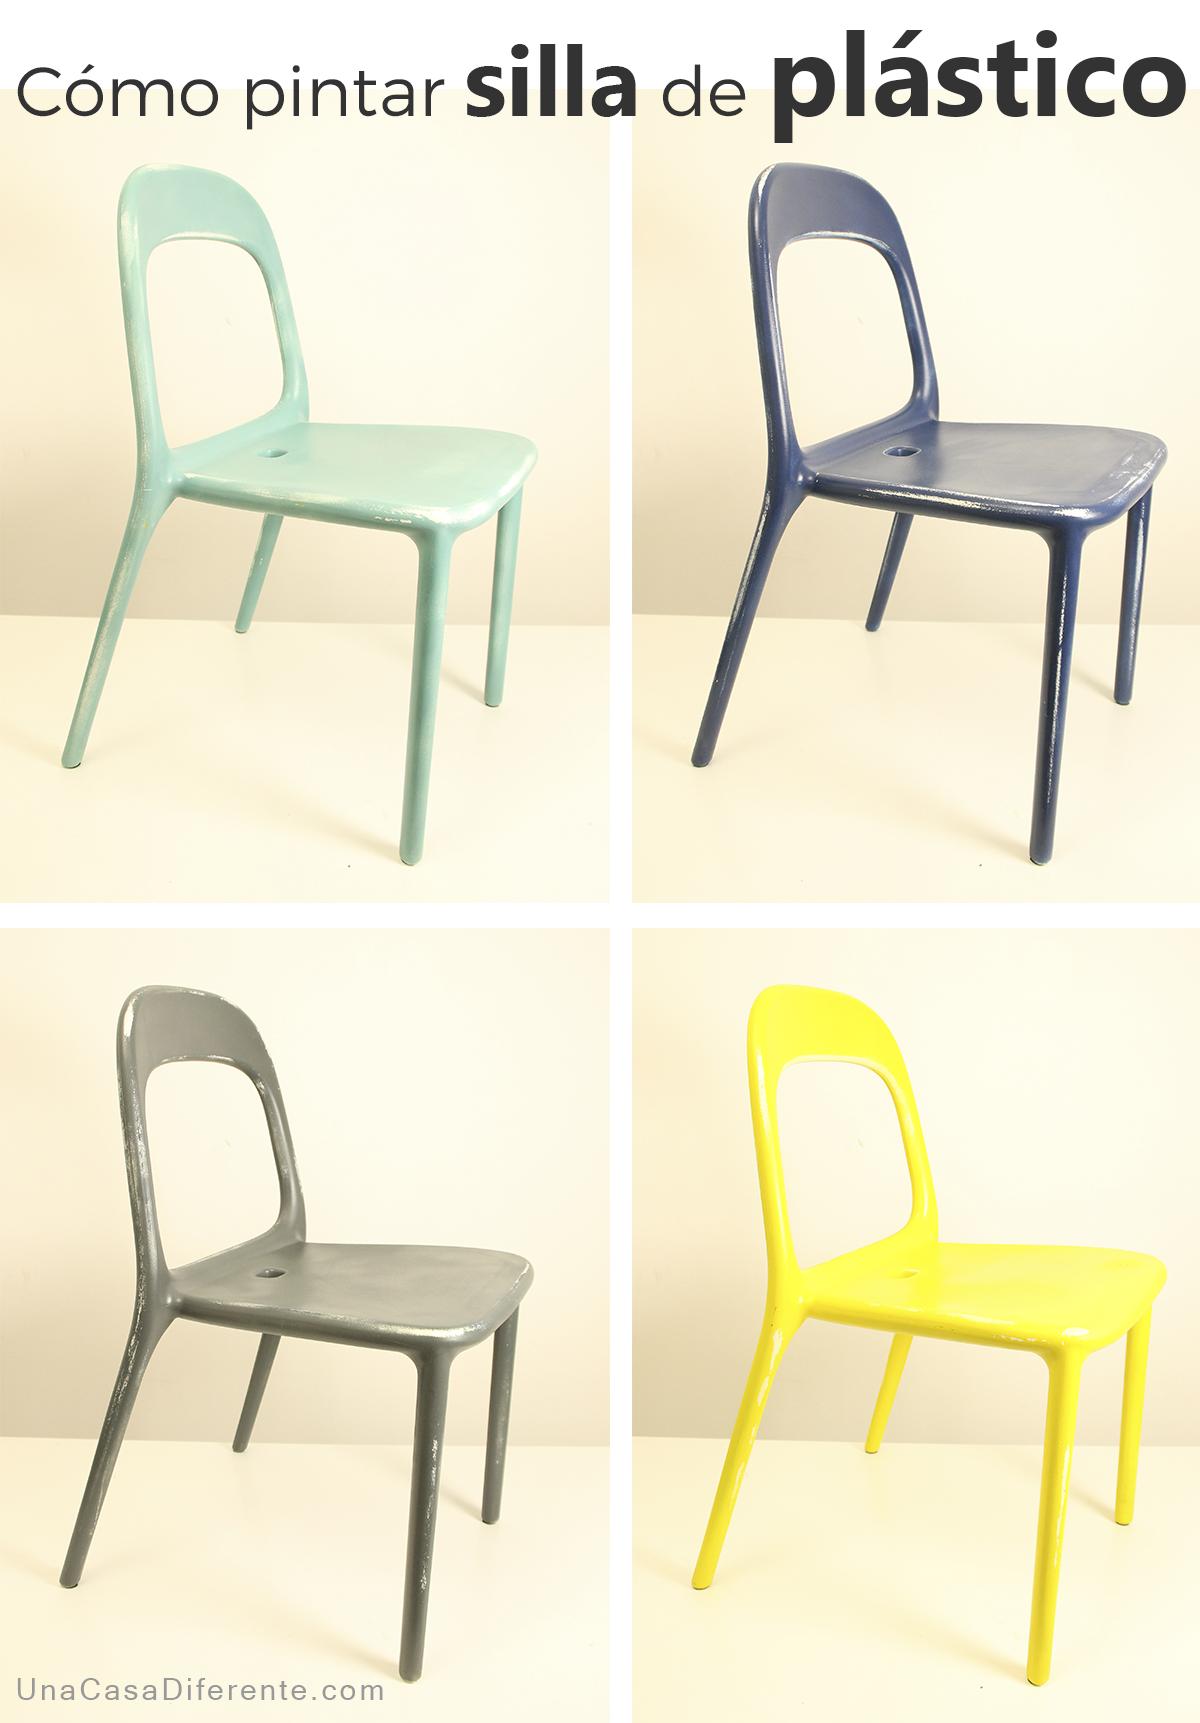 Como pintar sillas de plastico ikea hacks | Tips | Pinterest ...